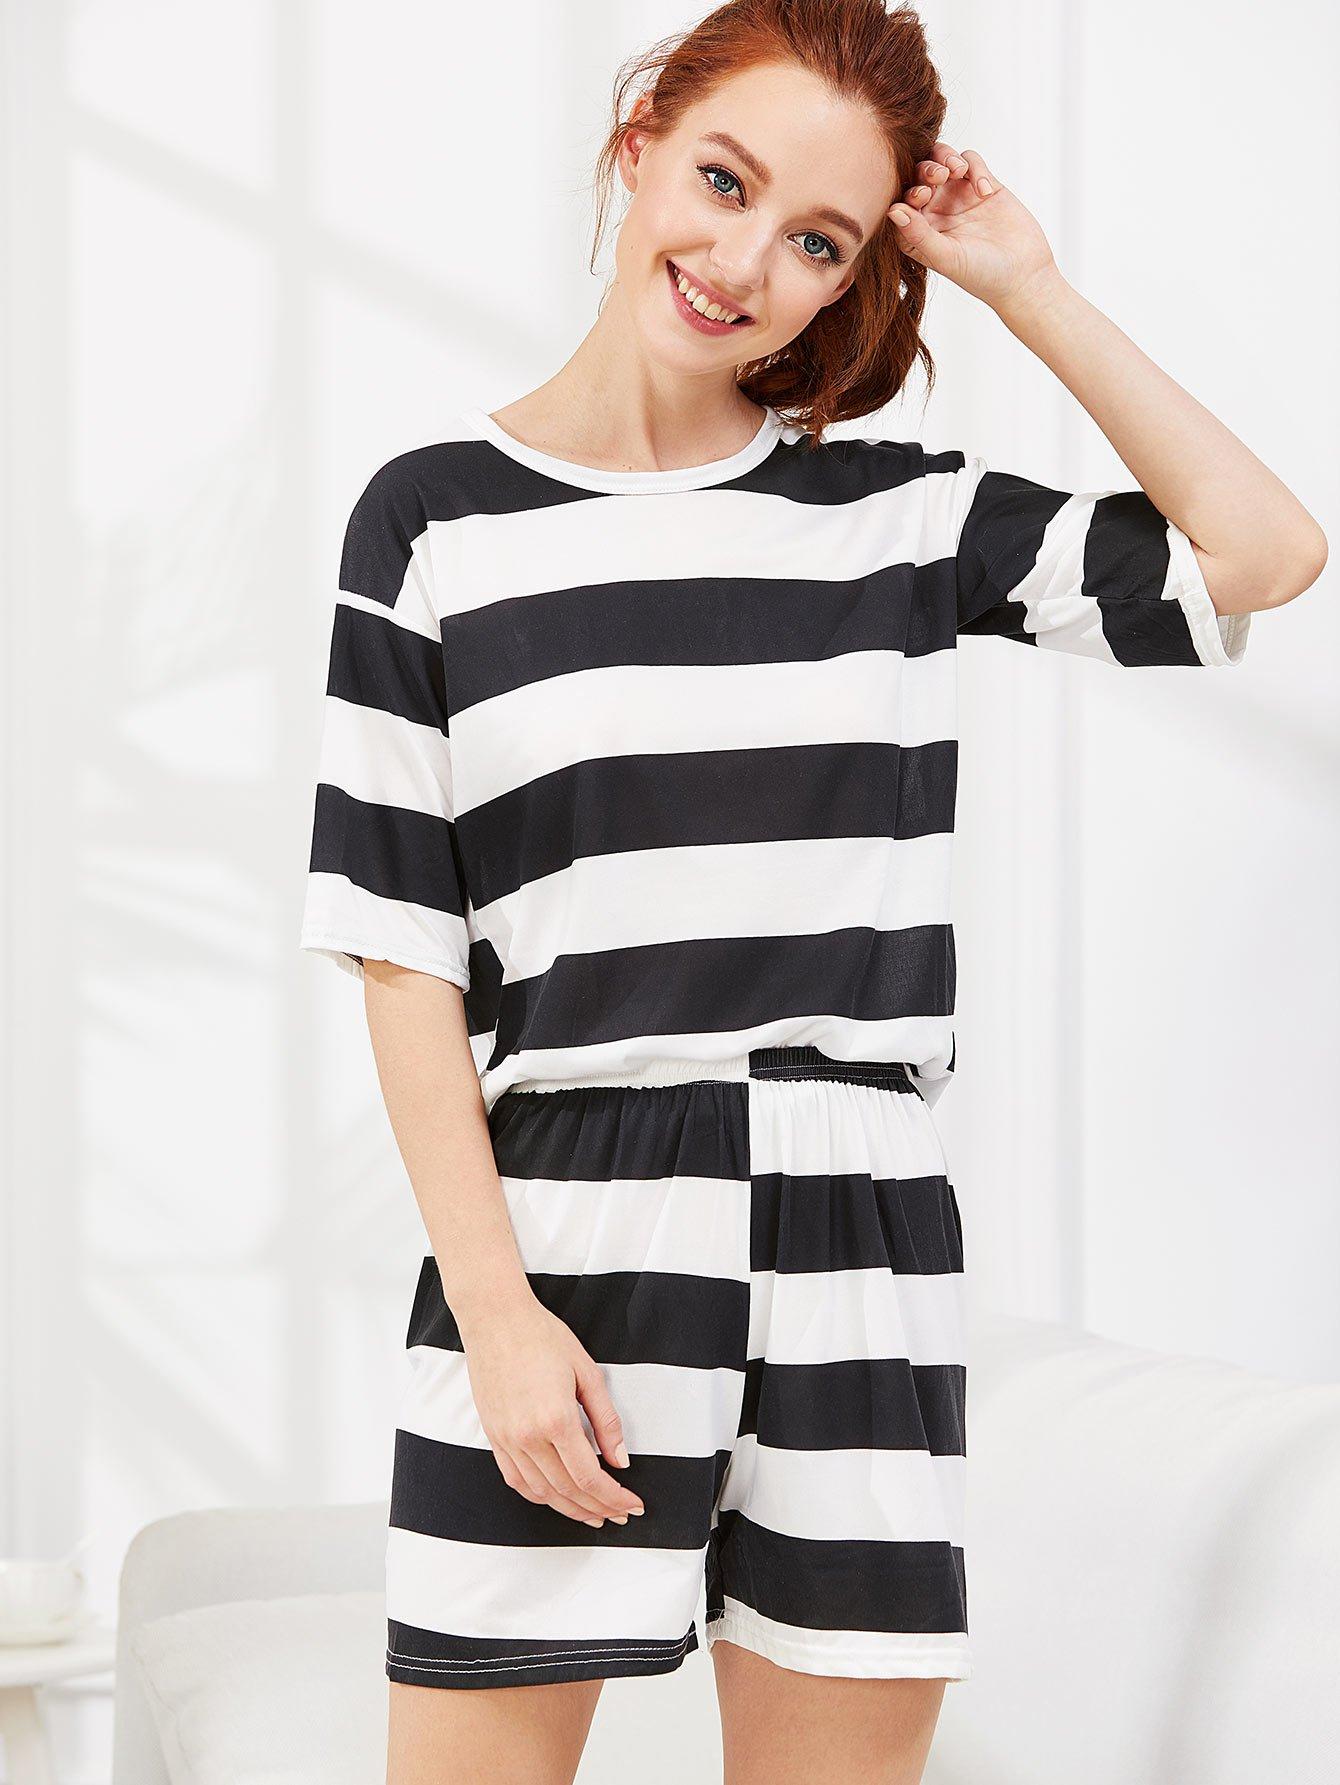 Contrast Striped Tee & Shorts PJ Set